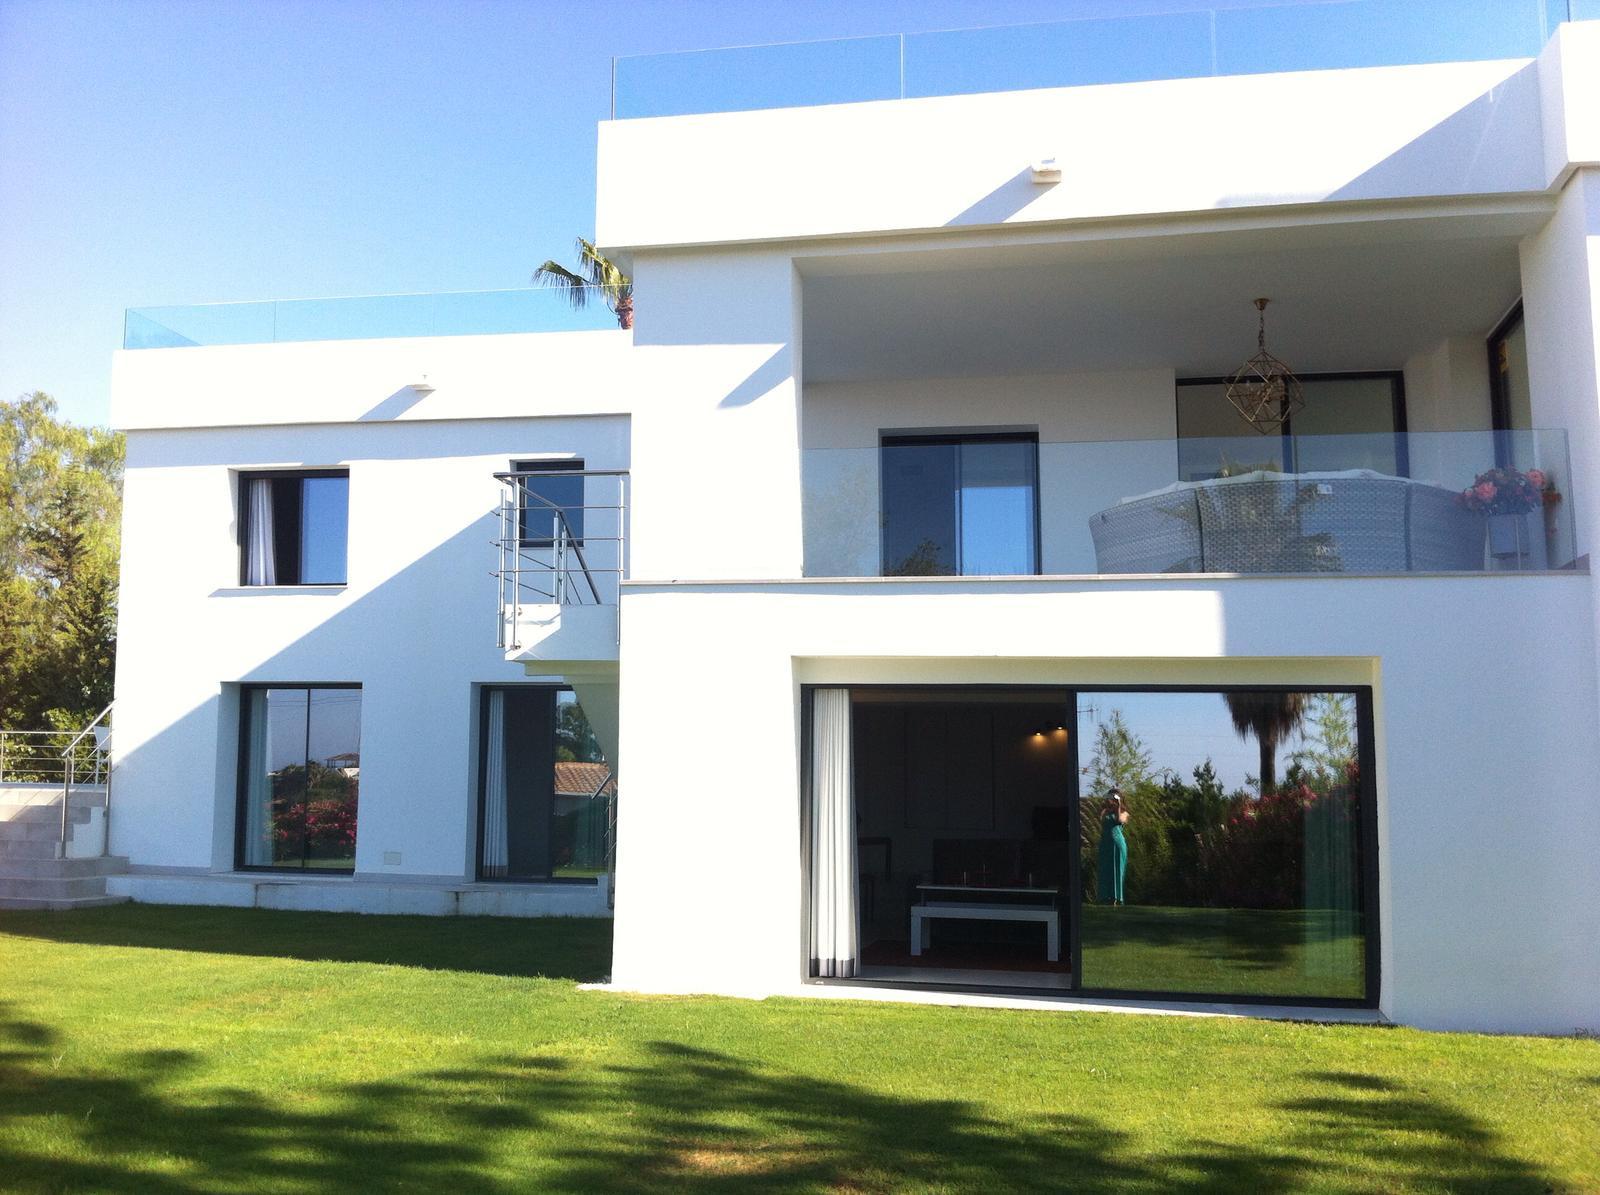 ARFV2073 - Schlüsselfertige moderne Villa in Nueva Andalucia in Marbella im Verkauf